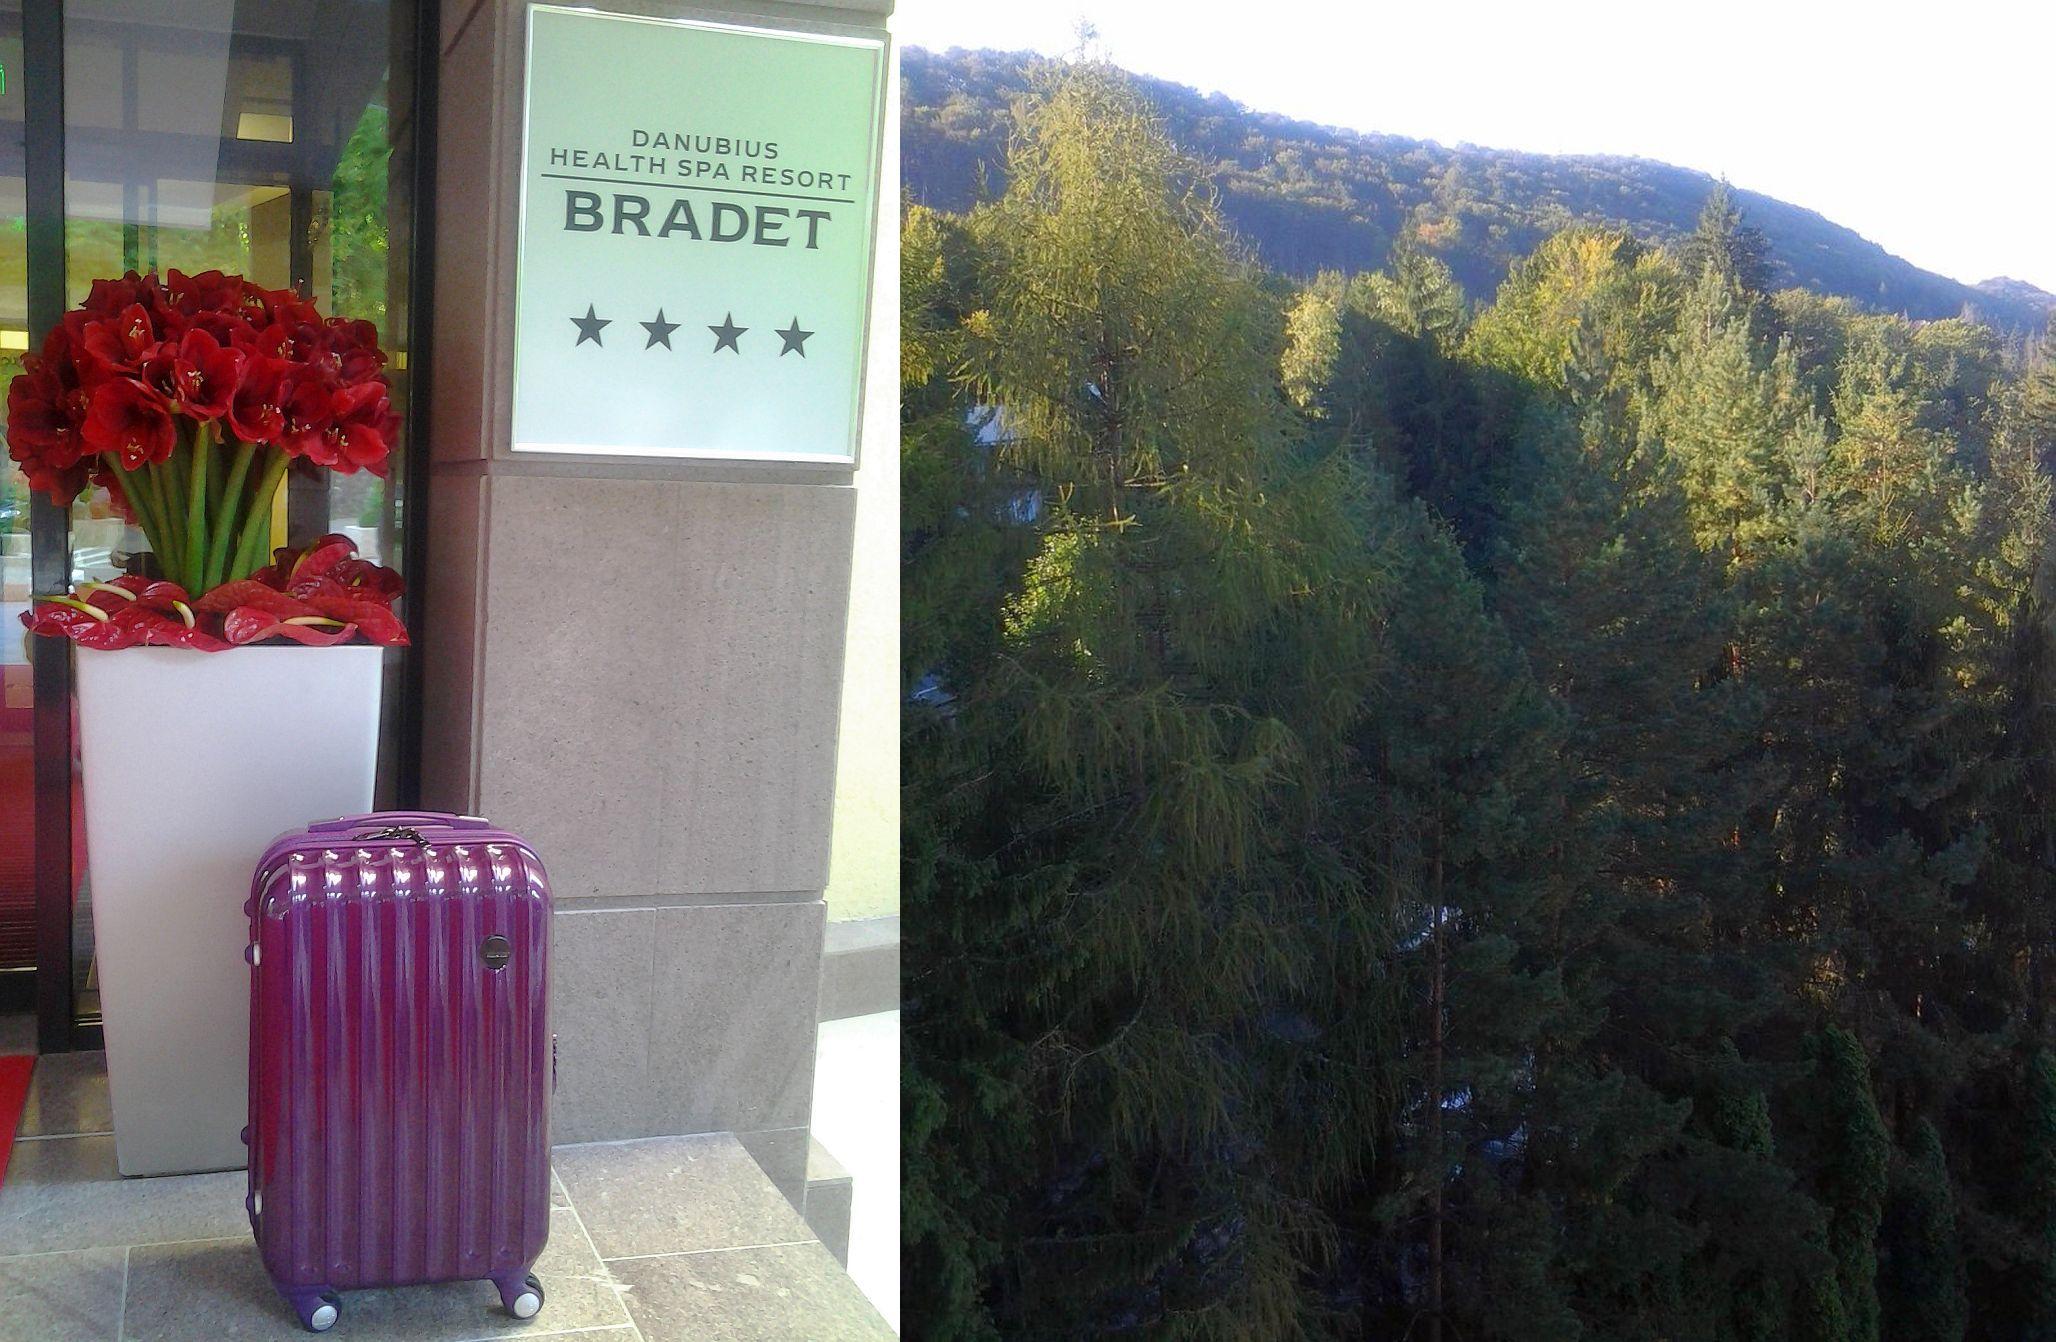 Purple Montzy de la Lamonza  m-a insotit cu gratie si eficienta in calatoria la Danubius Health Spa Resort Bradet